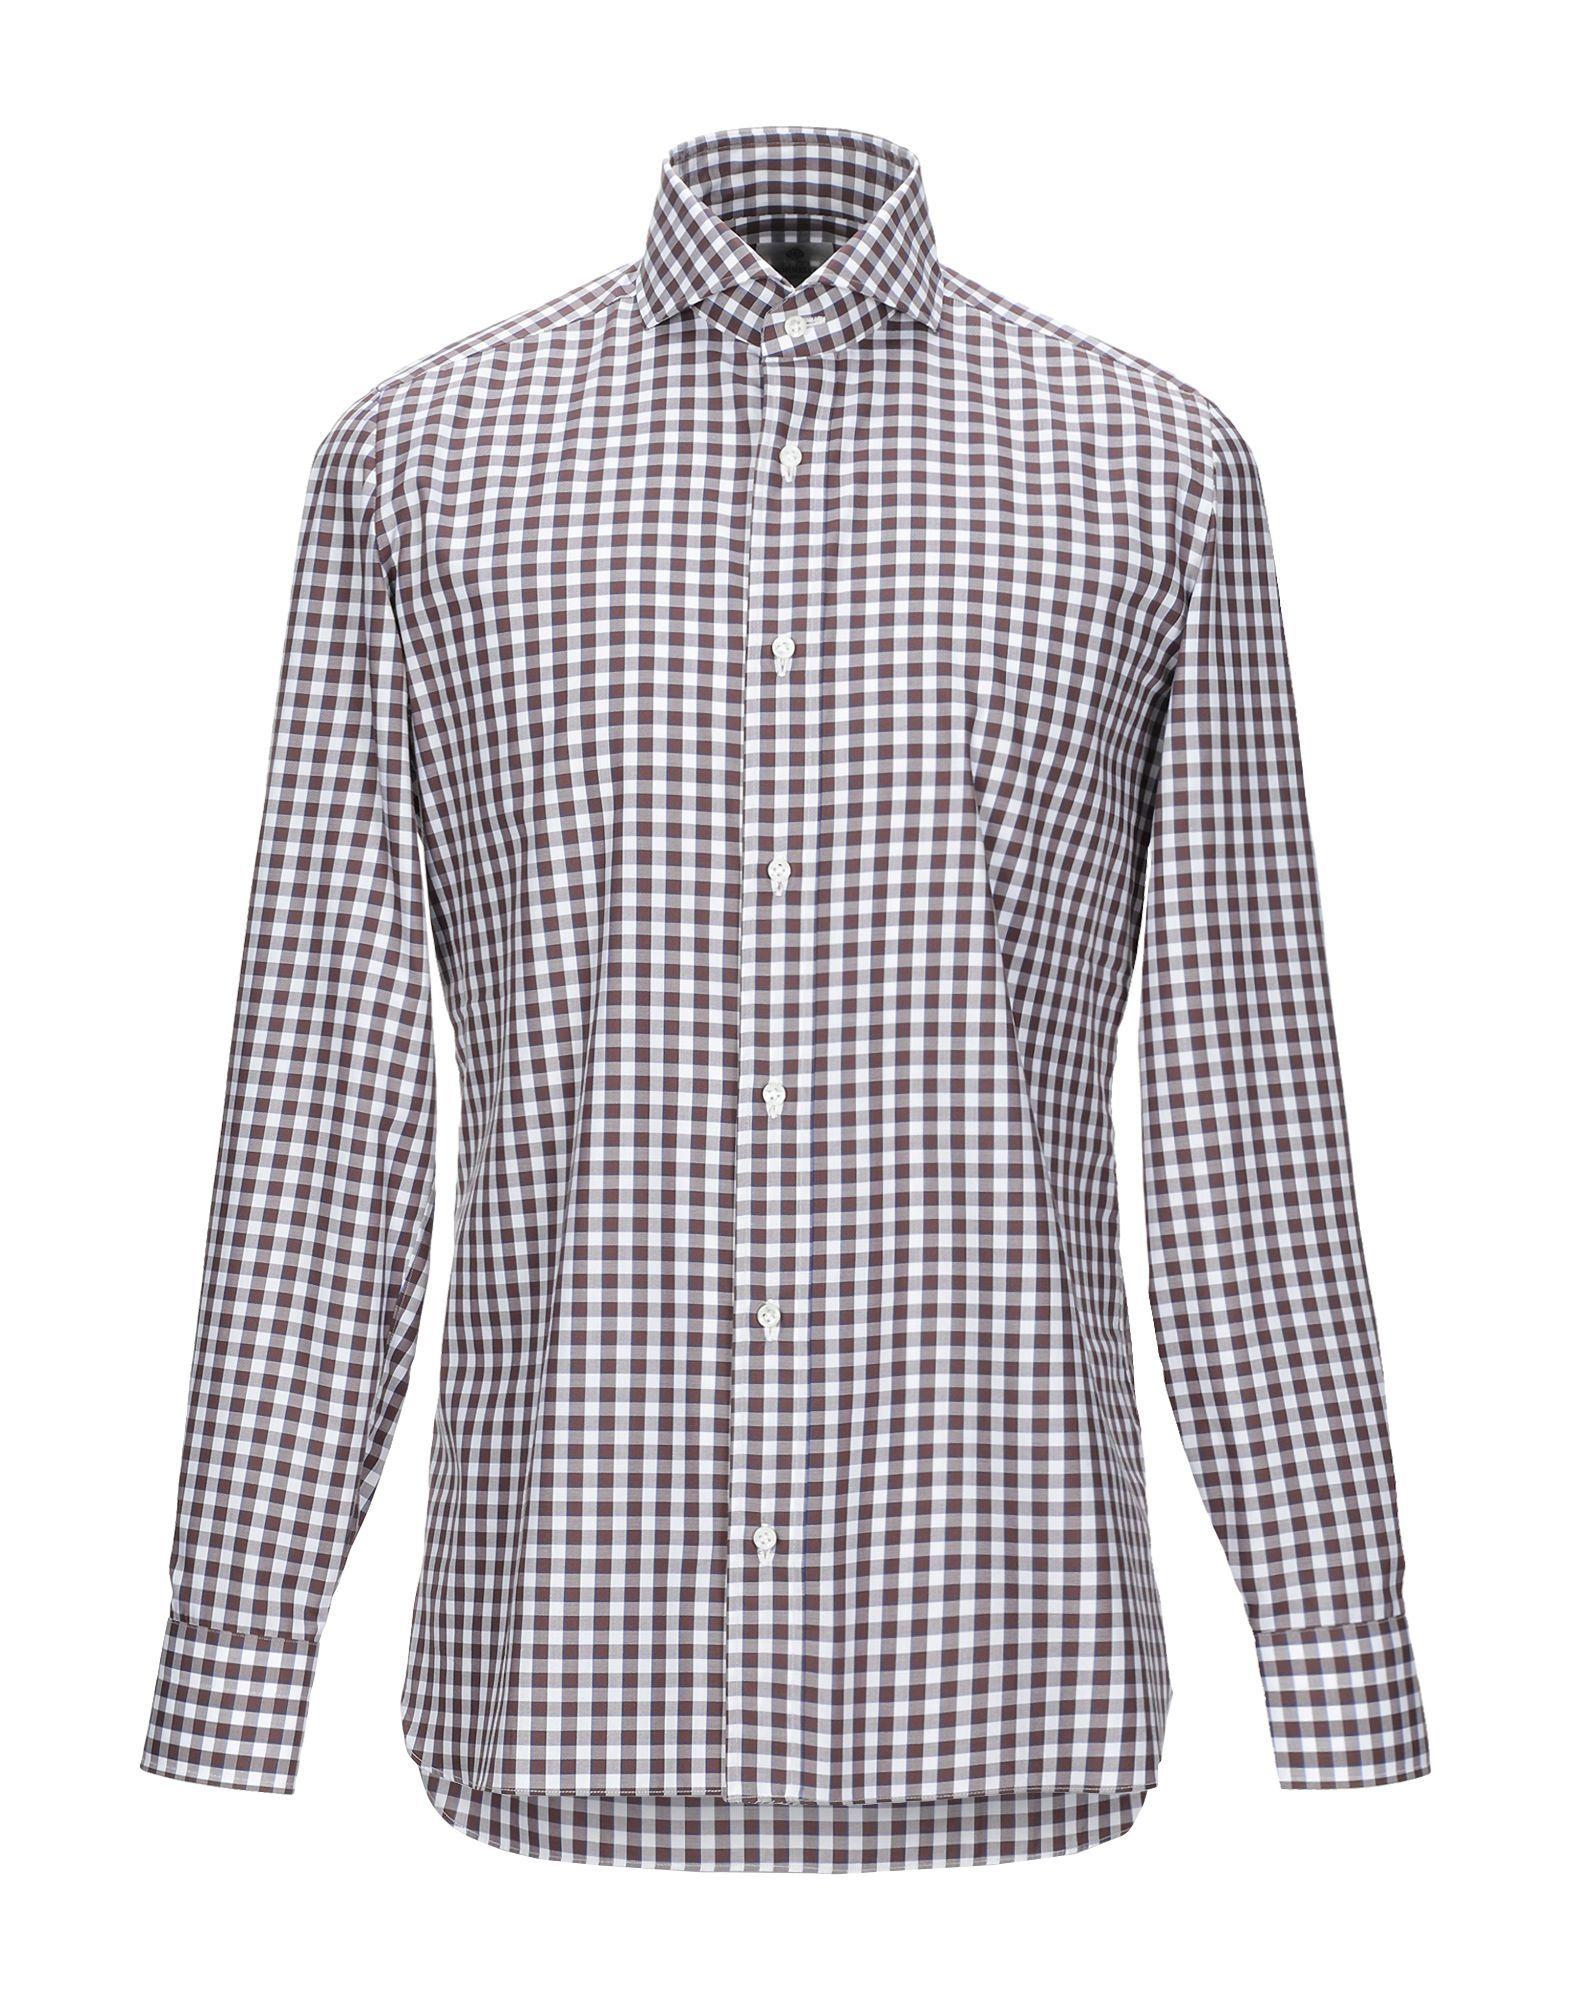 Luigi Borrelli Napoli Cocoa Check Cotton Shirt